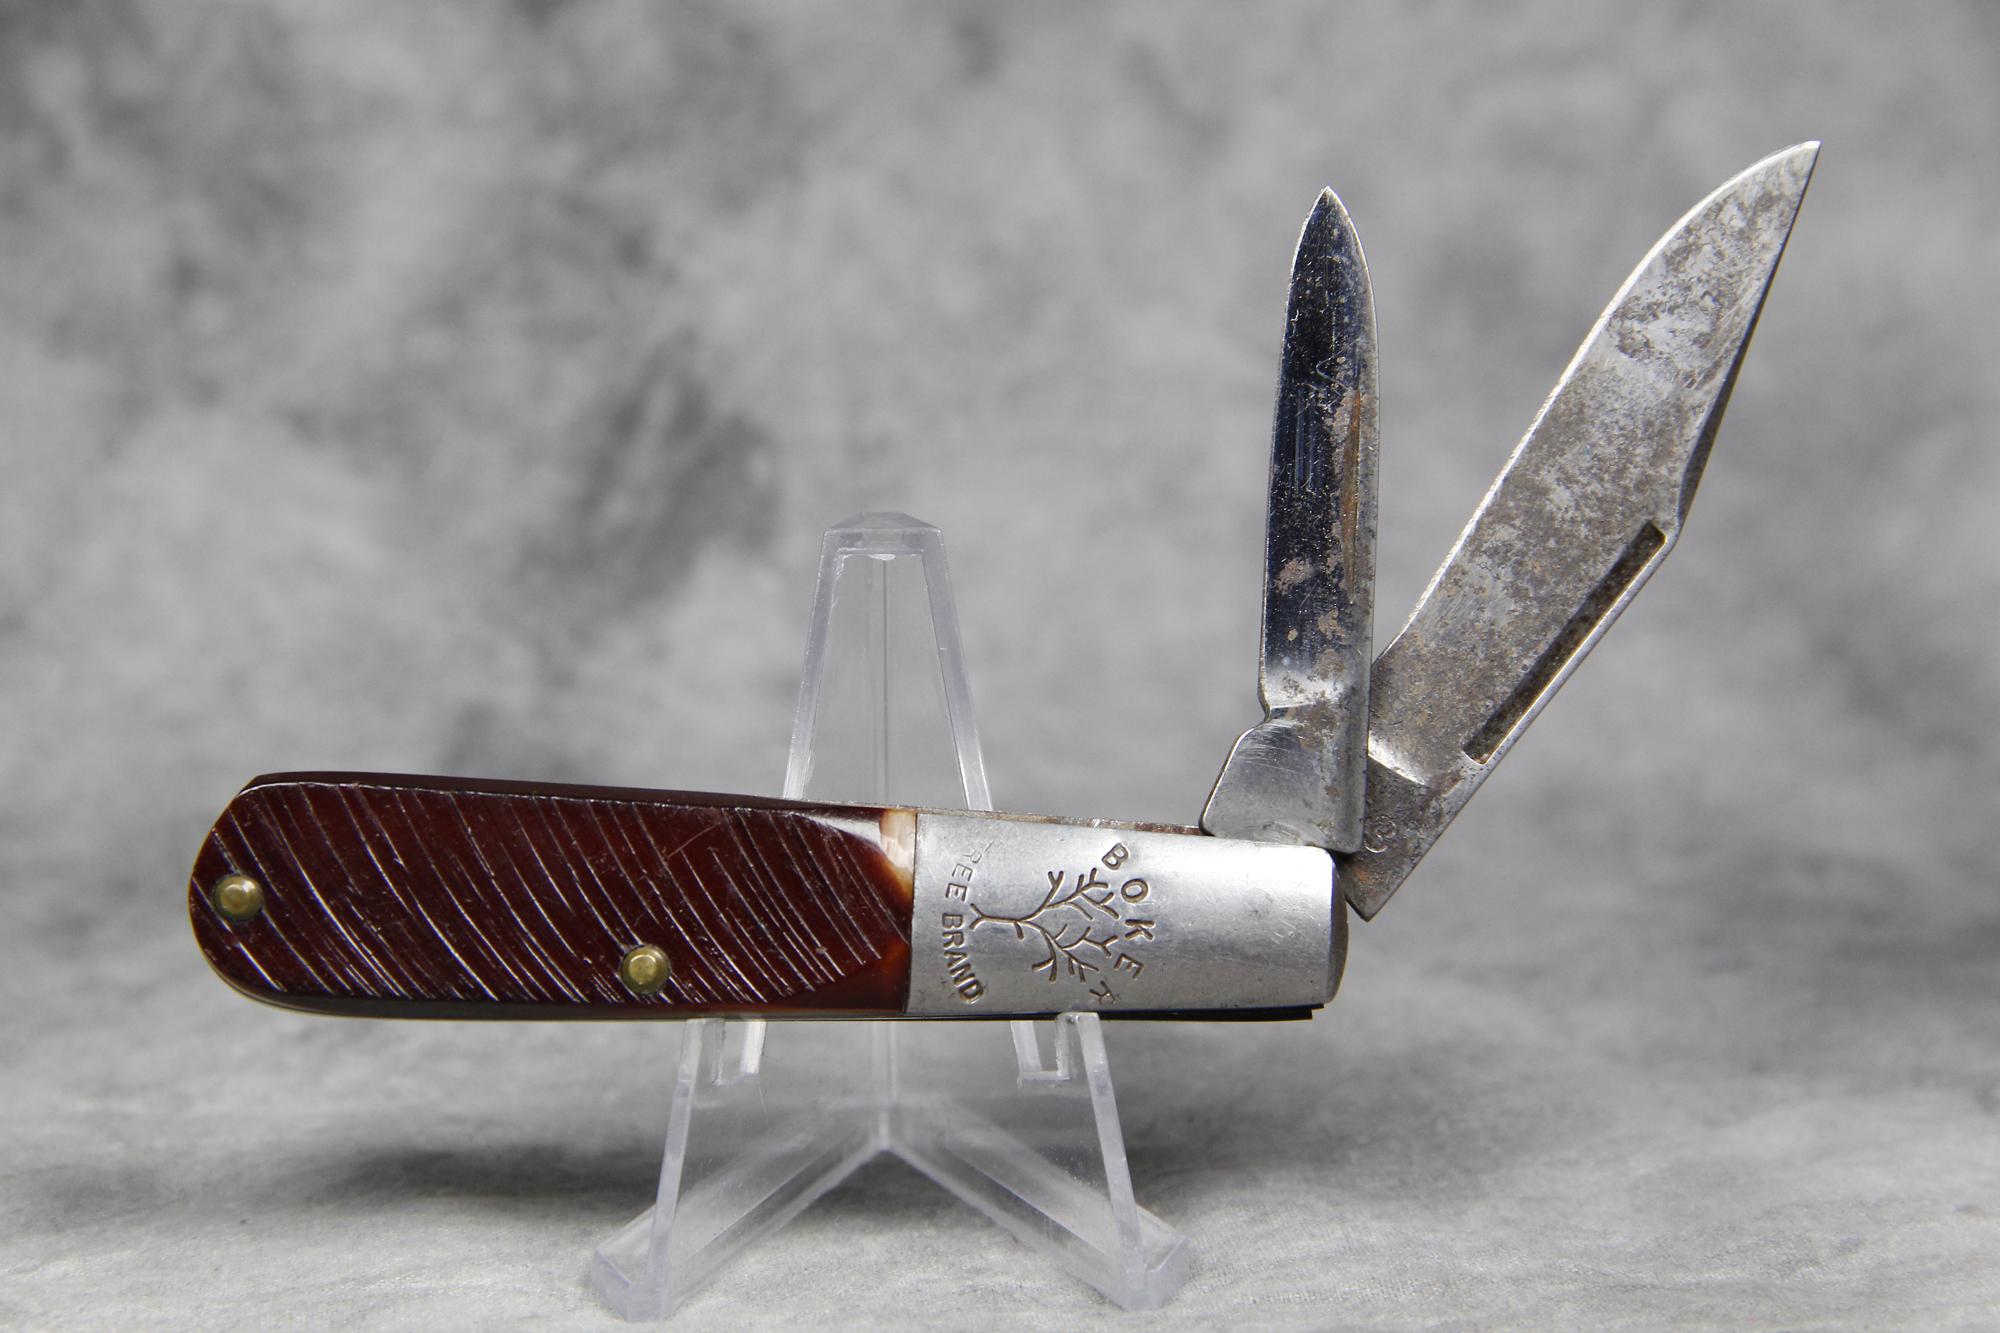 Vintage BOKER TREE BRAND 493 Sawcut Barlow Pocket Knife